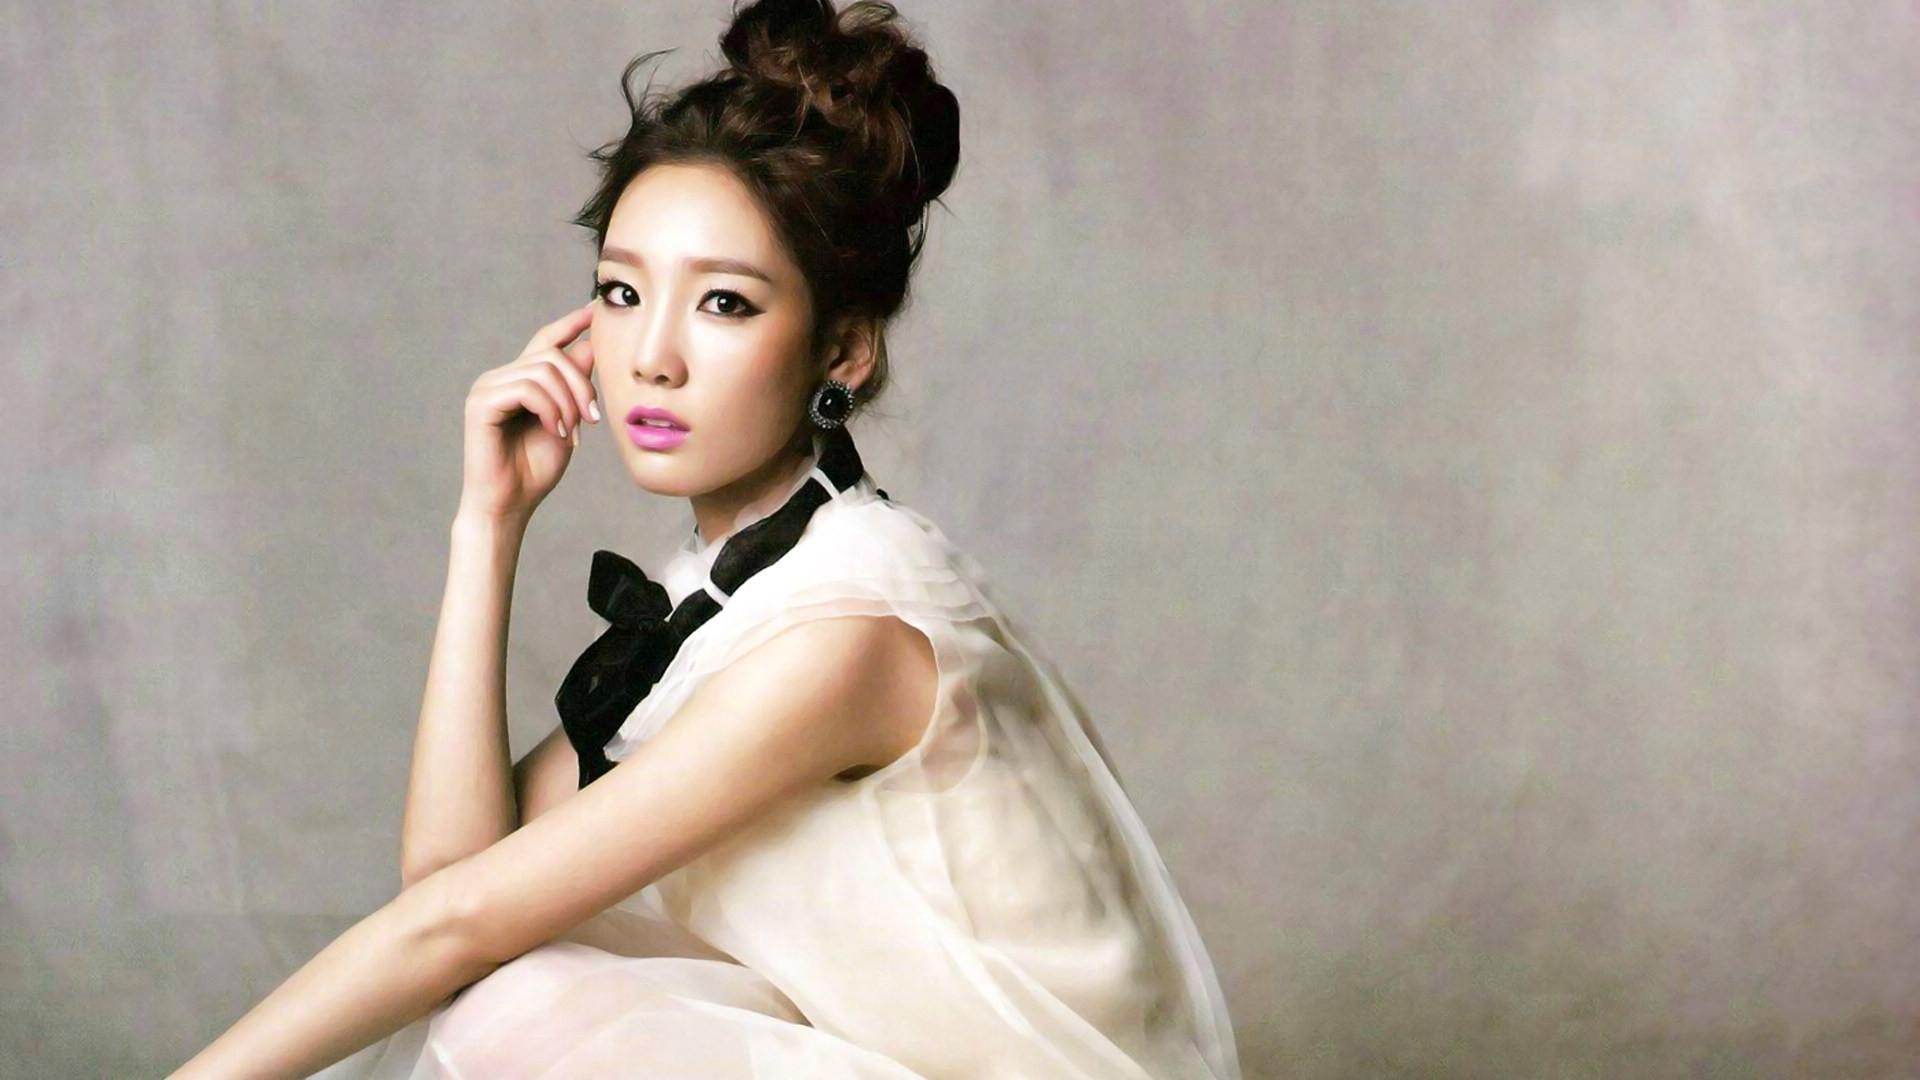 Jessica | Female Celebrities, Music, and Dance Steps | Pinterest .